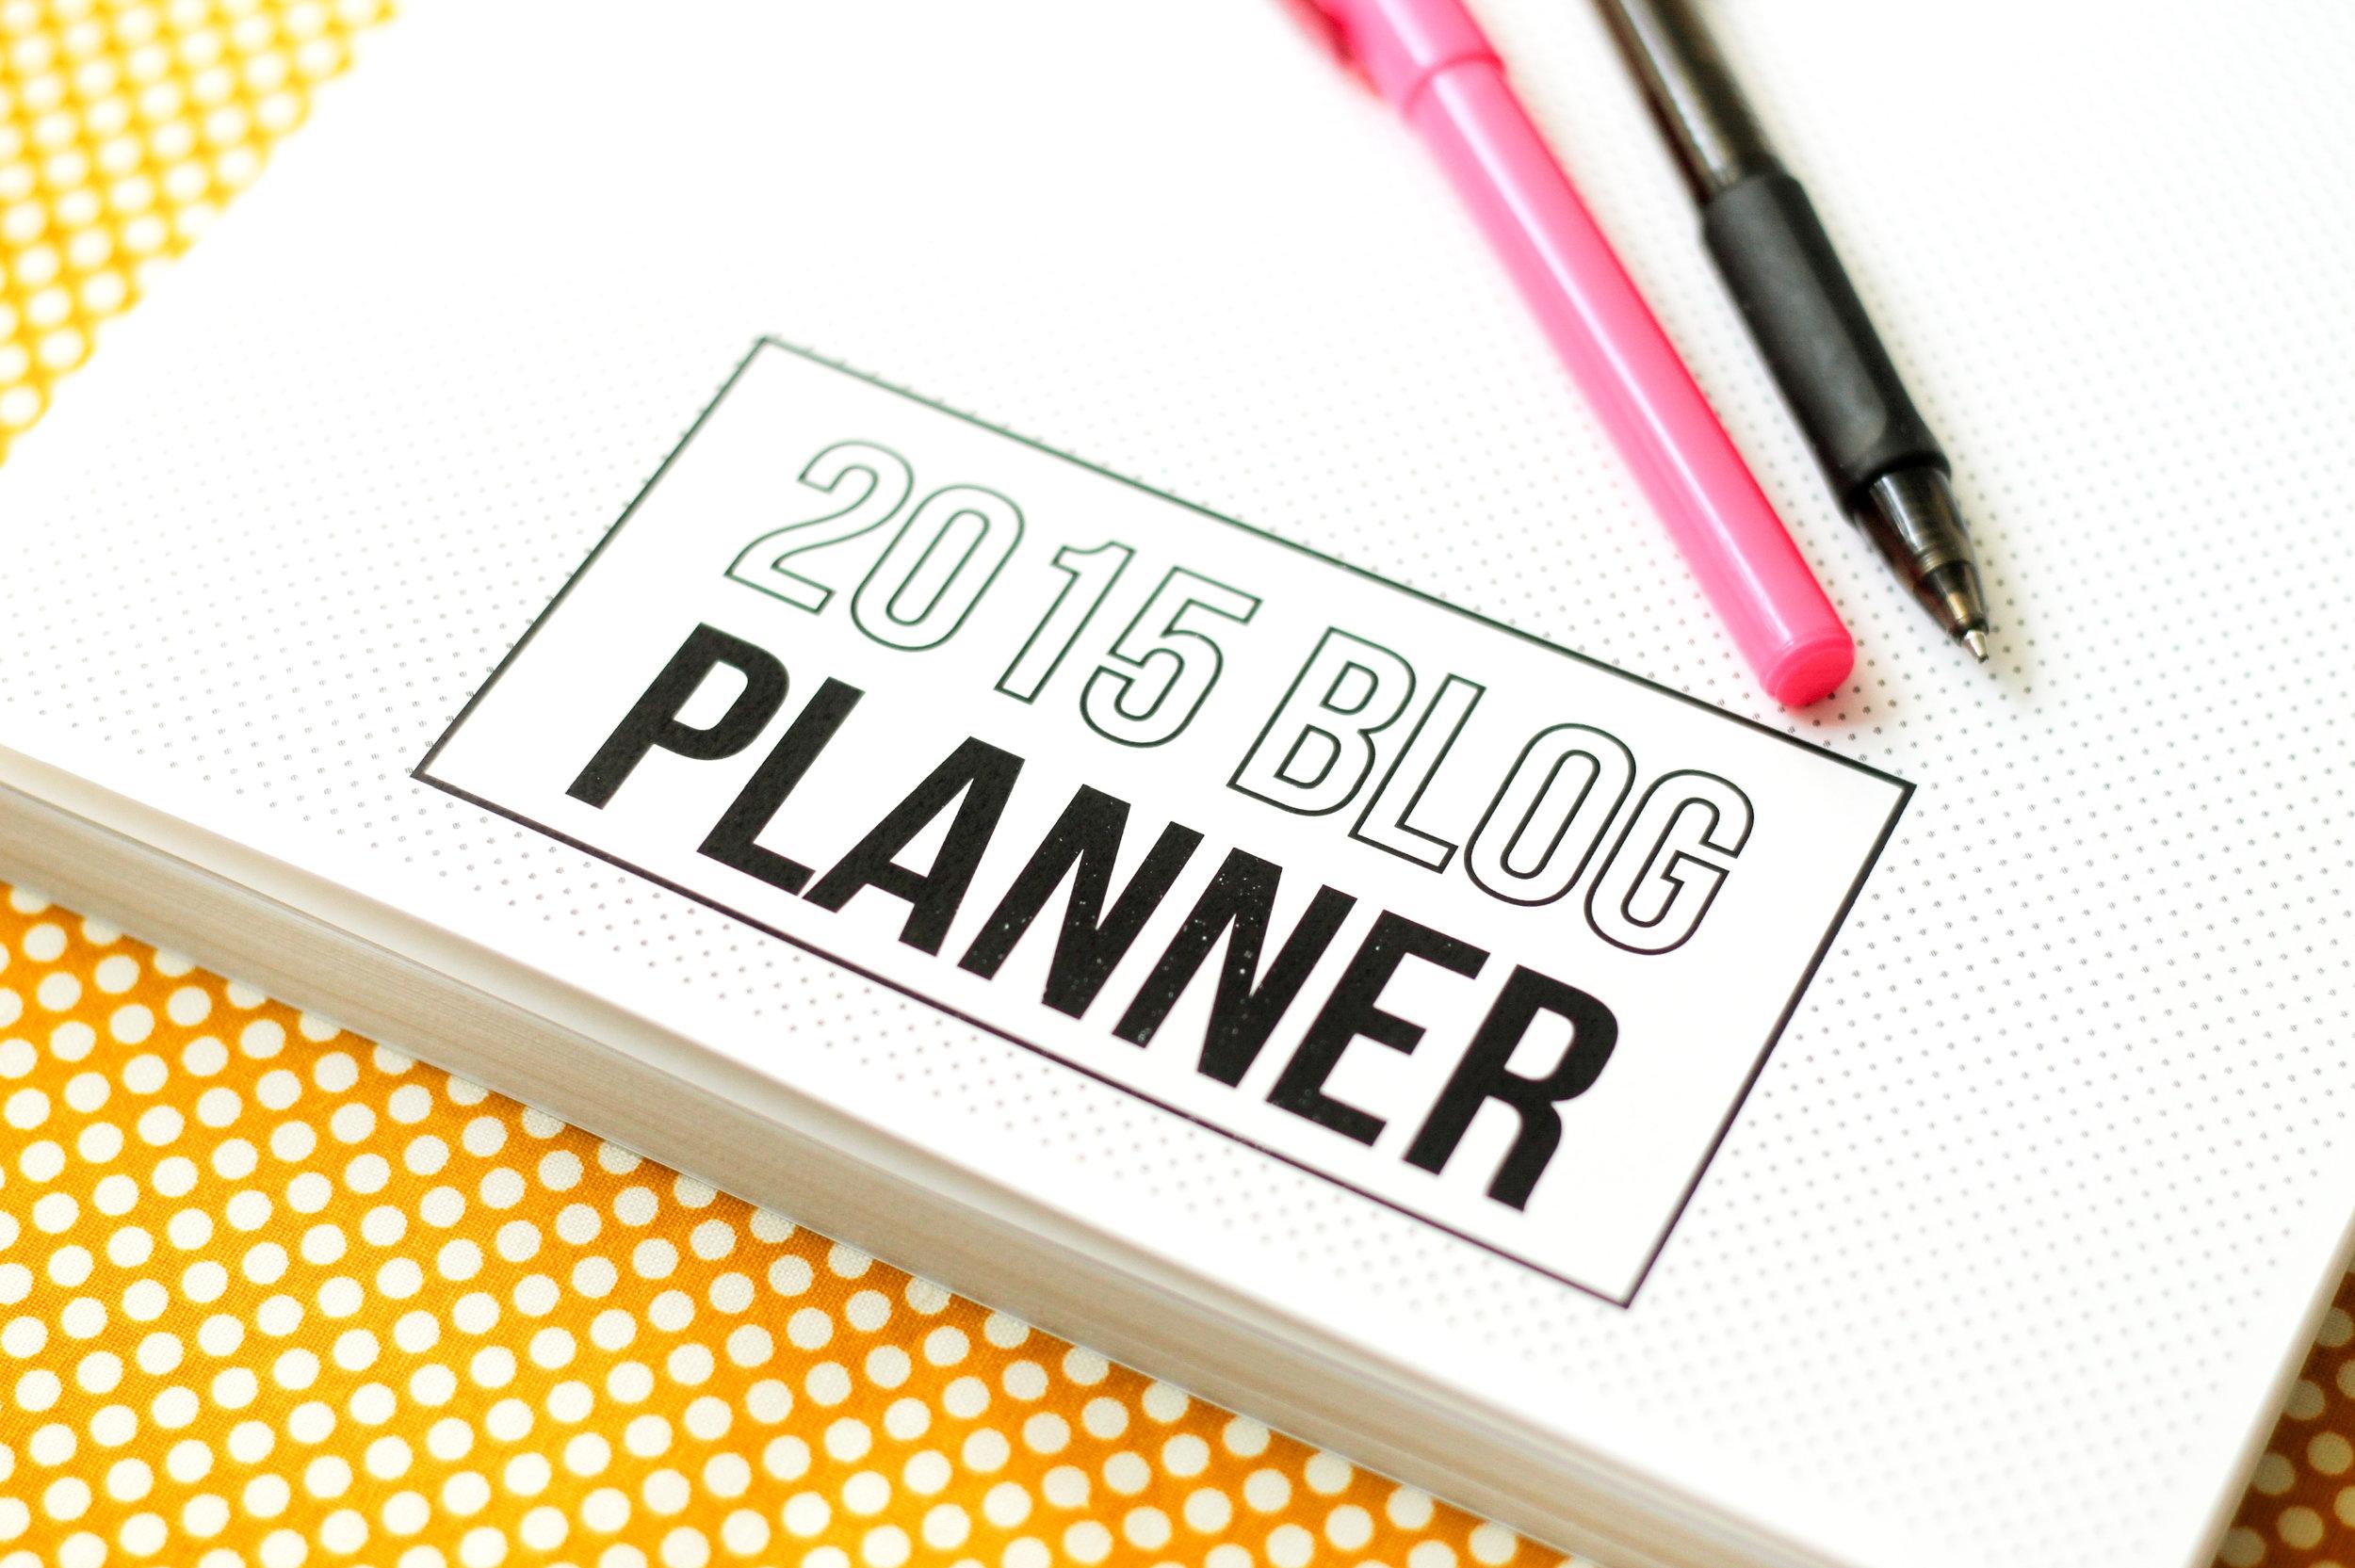 2015 Blog Planner and Editorial Calendar